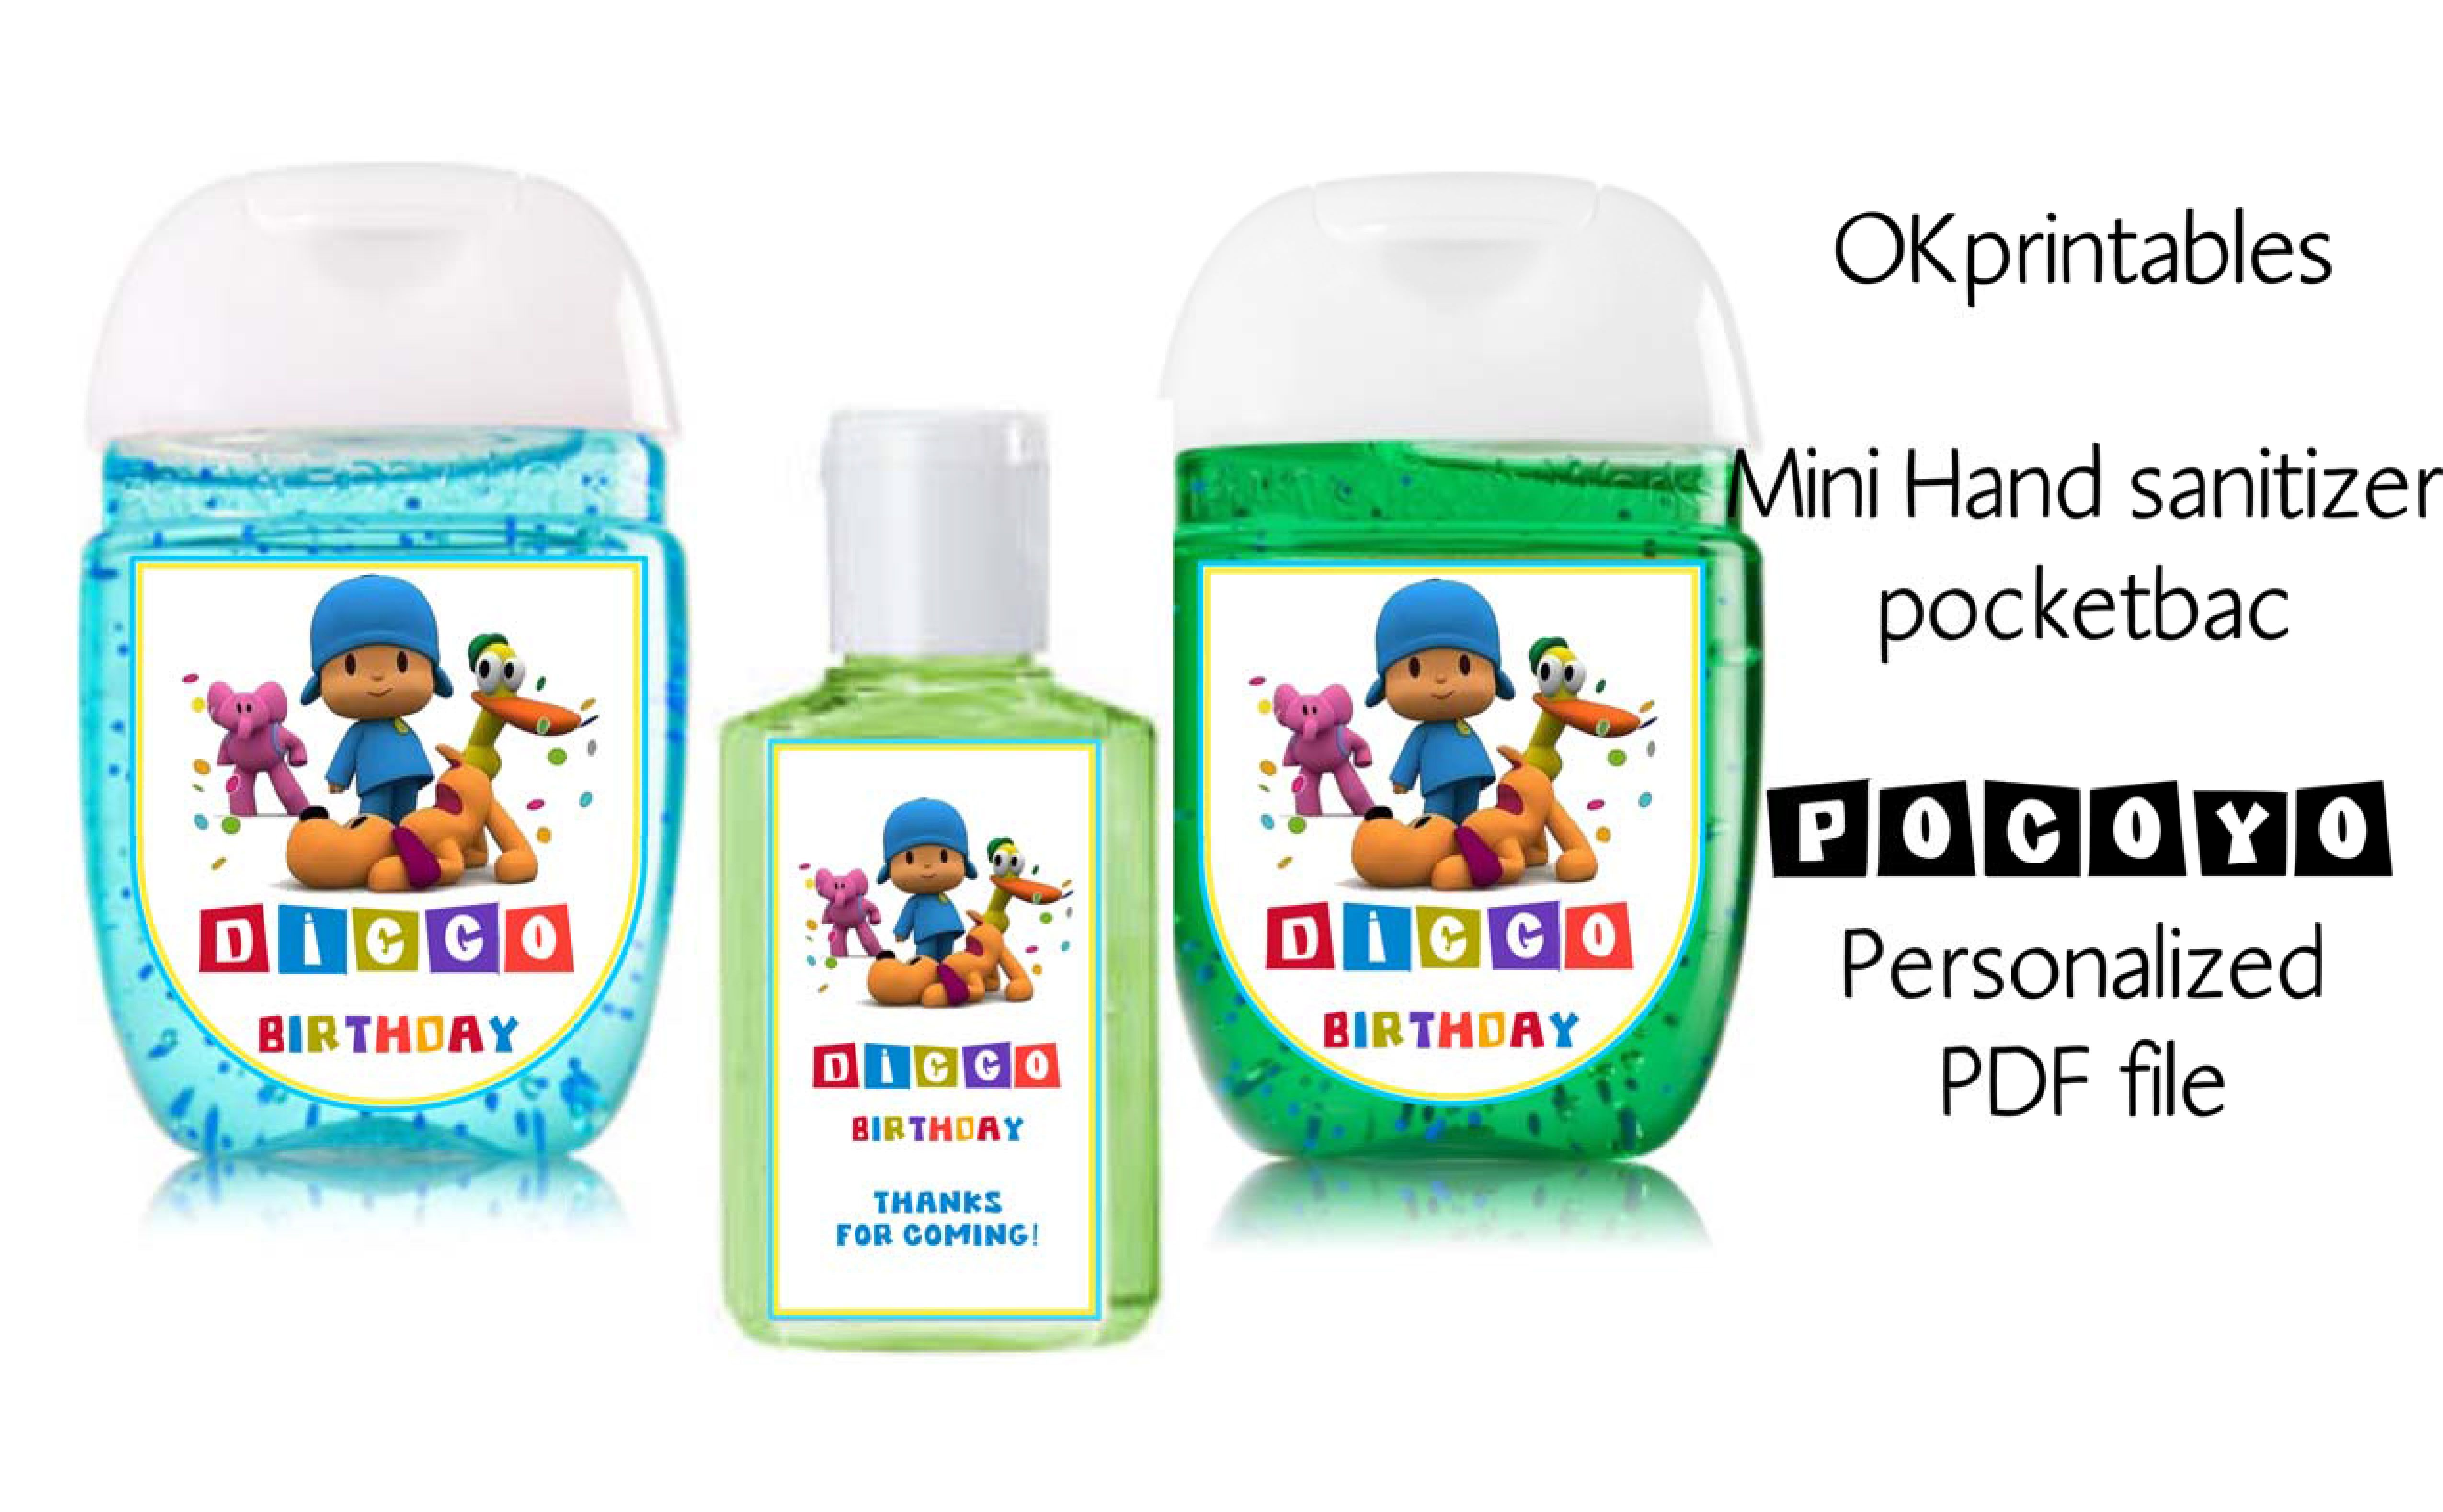 Birthday Personalized Hand Sanitizer Personalized Birthday